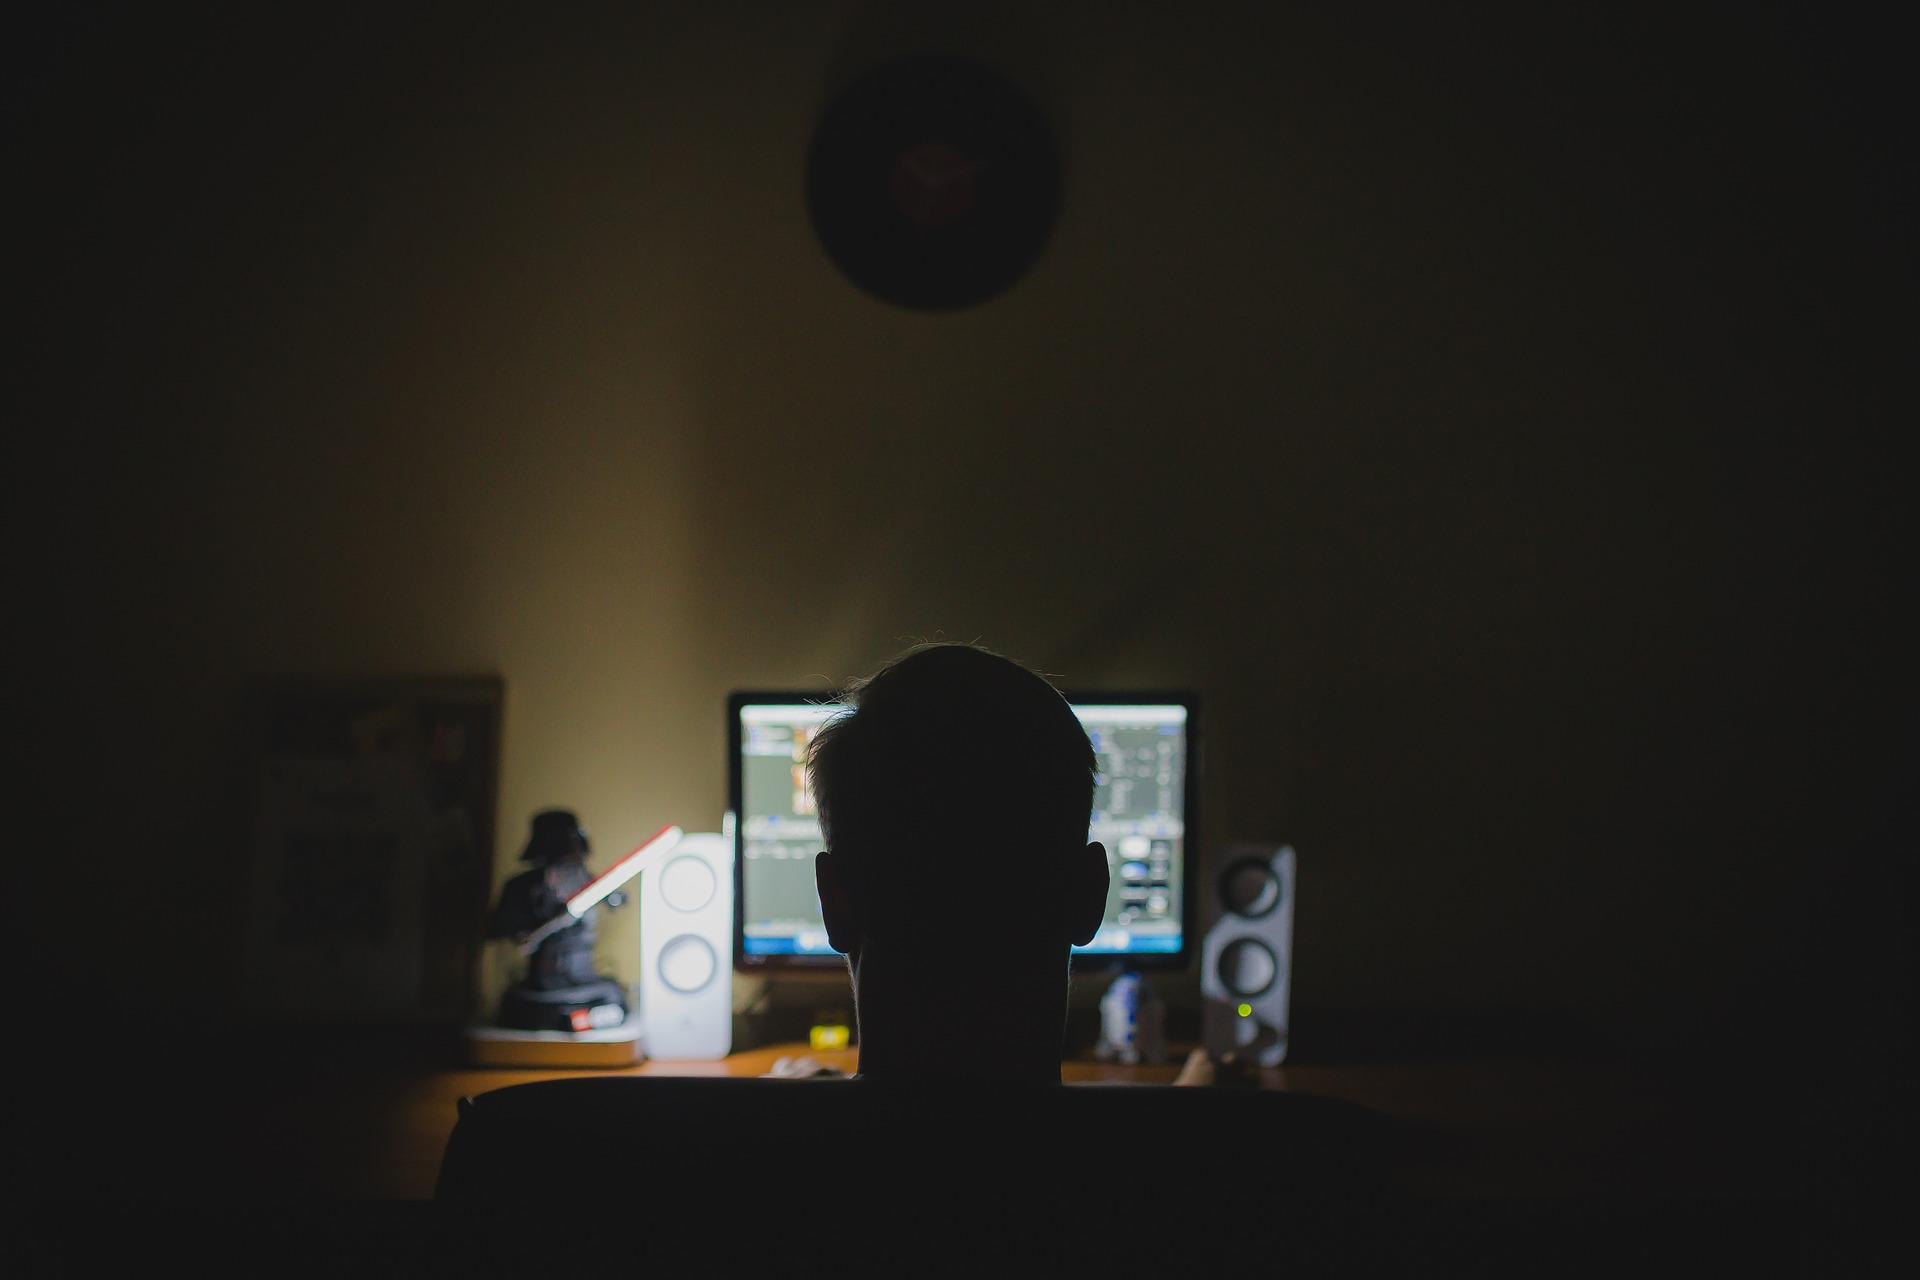 Hacker-Erpressung-Computer